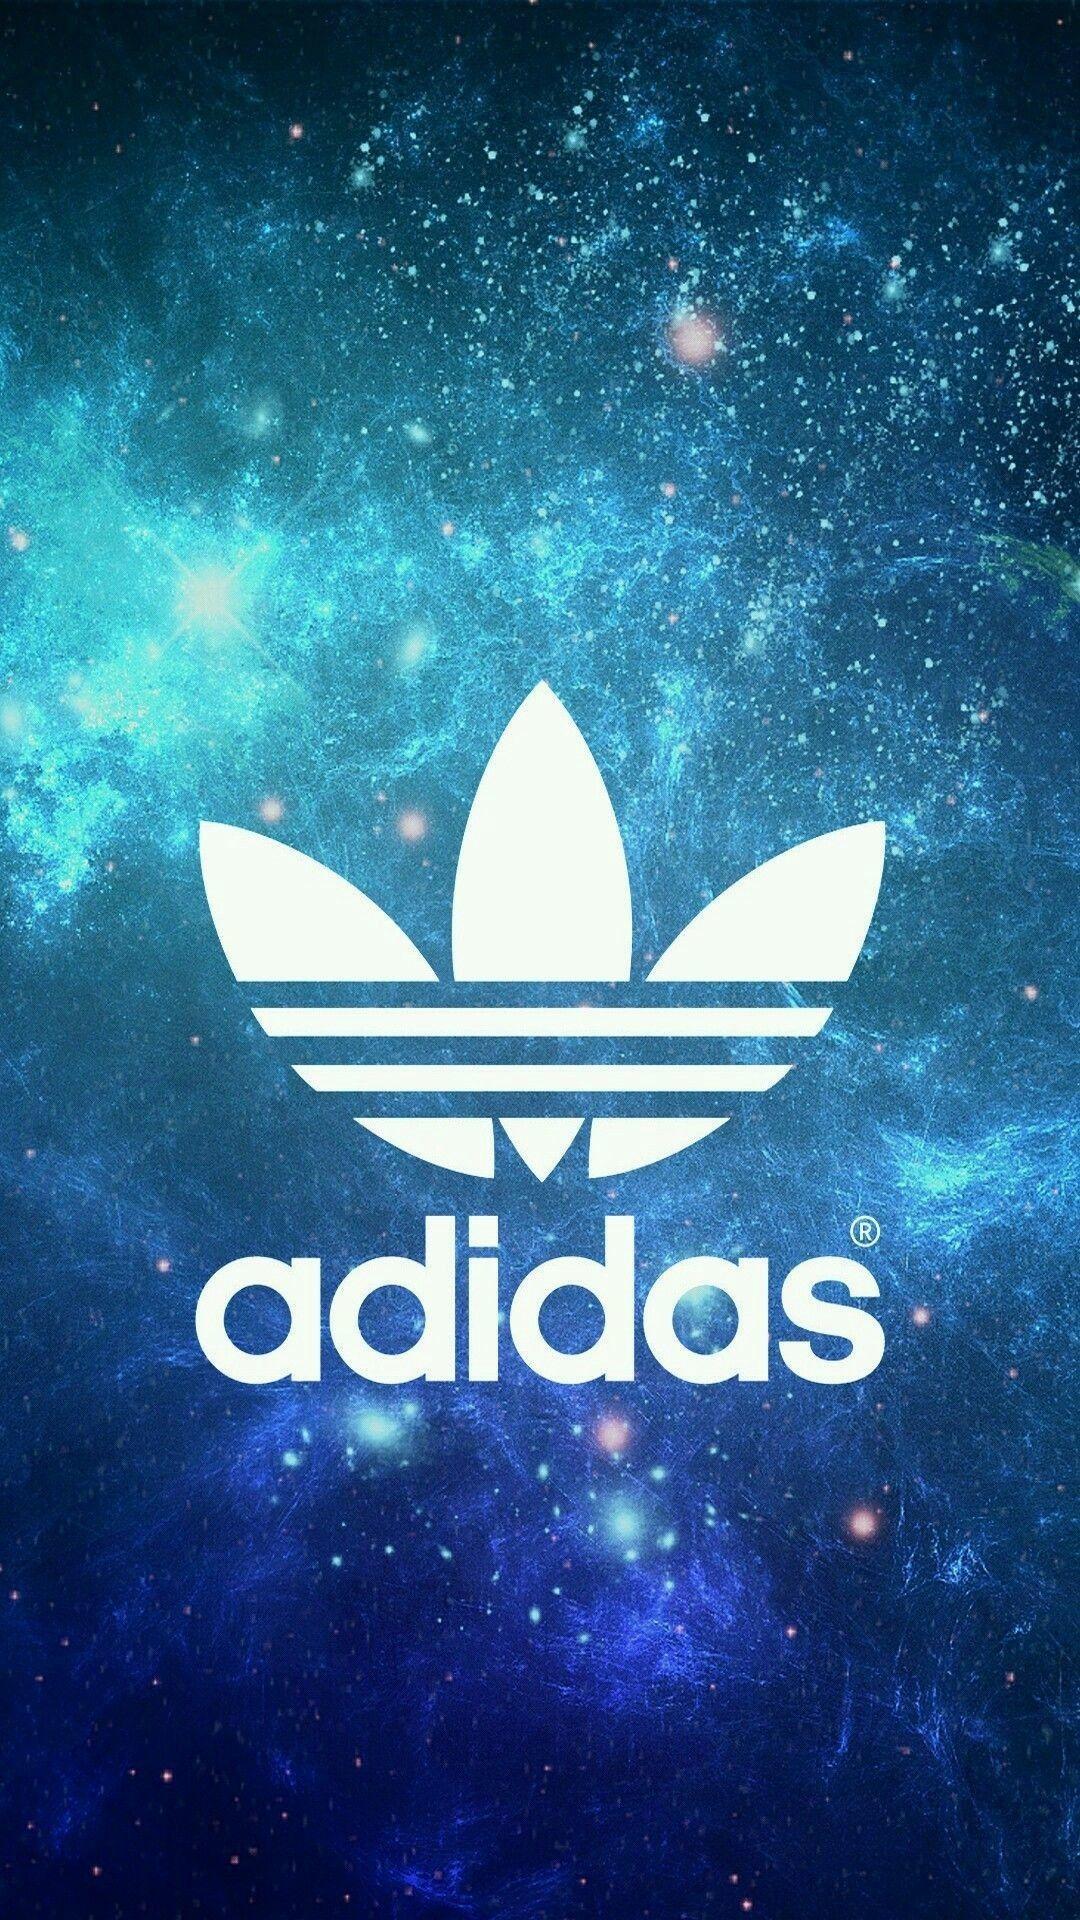 Adidas Galaxy Wallpapers Top Free Adidas Galaxy Backgrounds